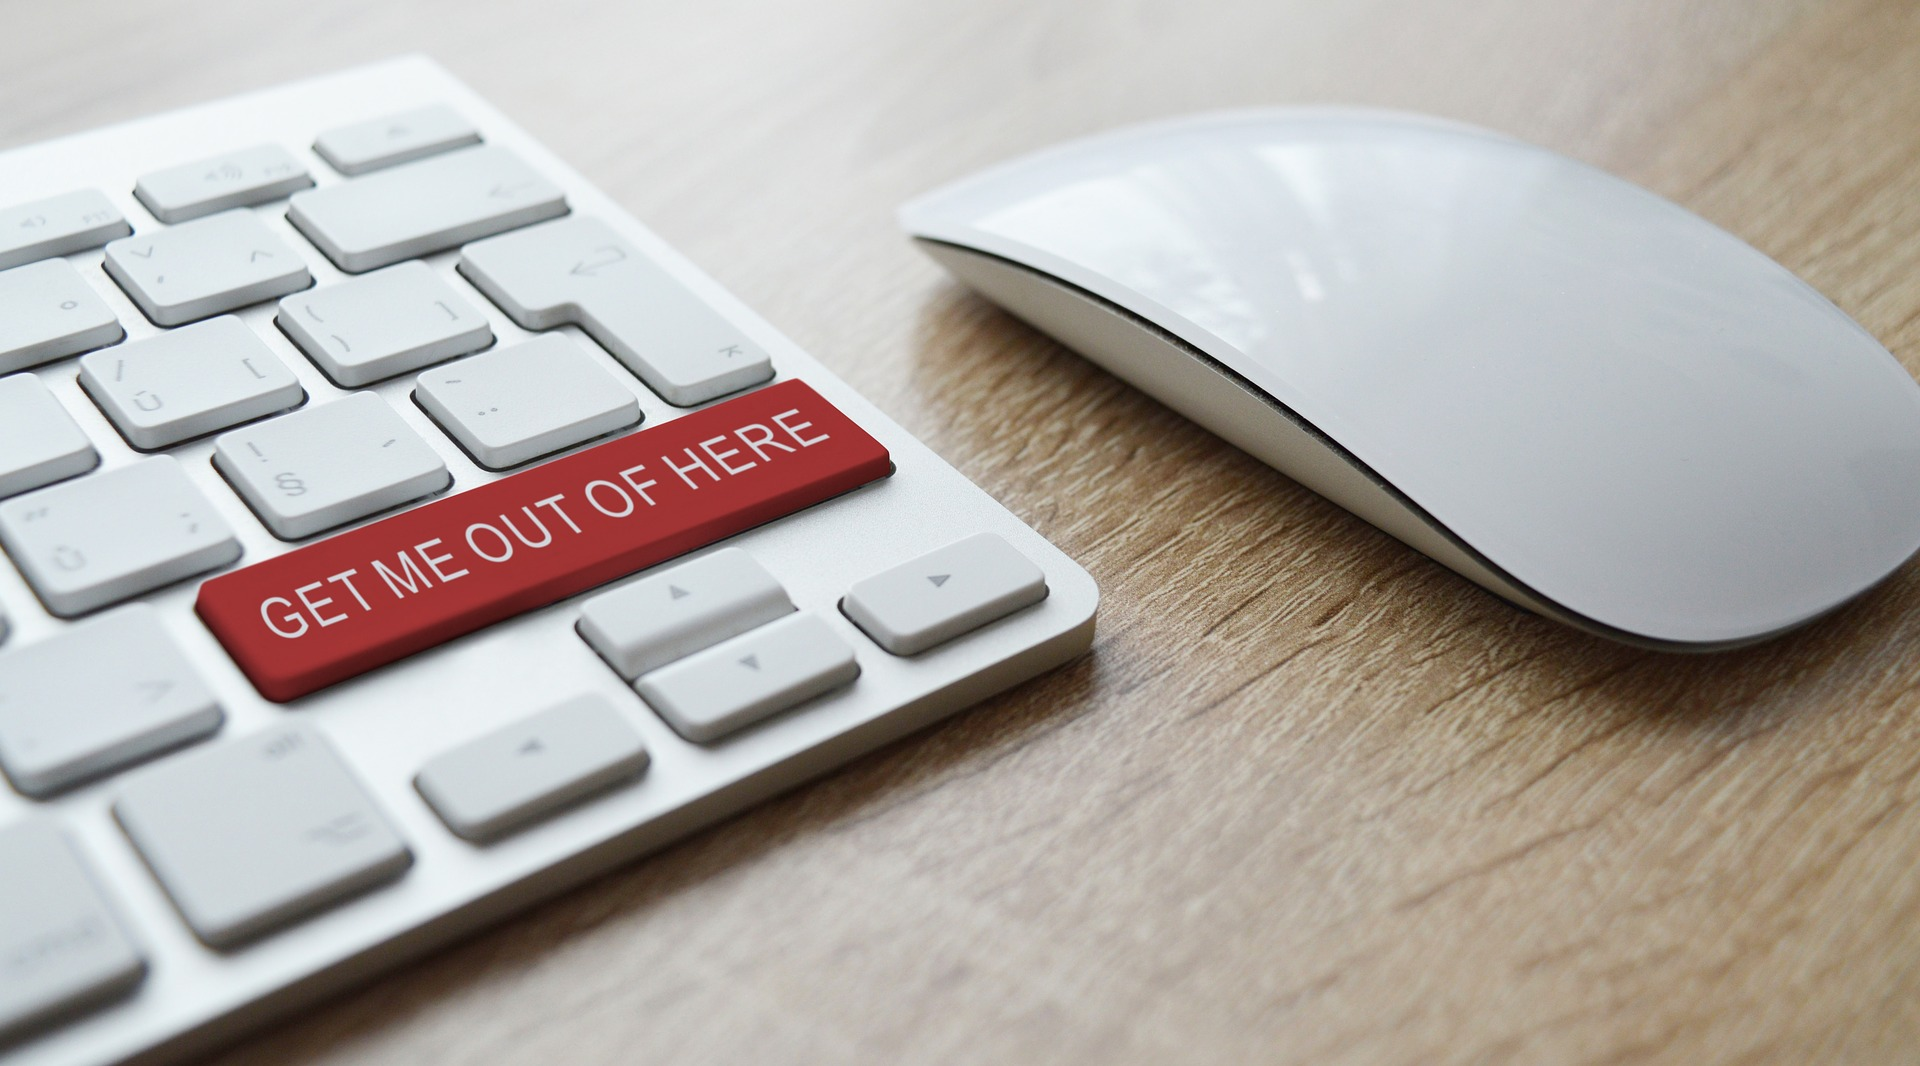 Is Pokcoins.com a Scam and Untrustworthy Website?